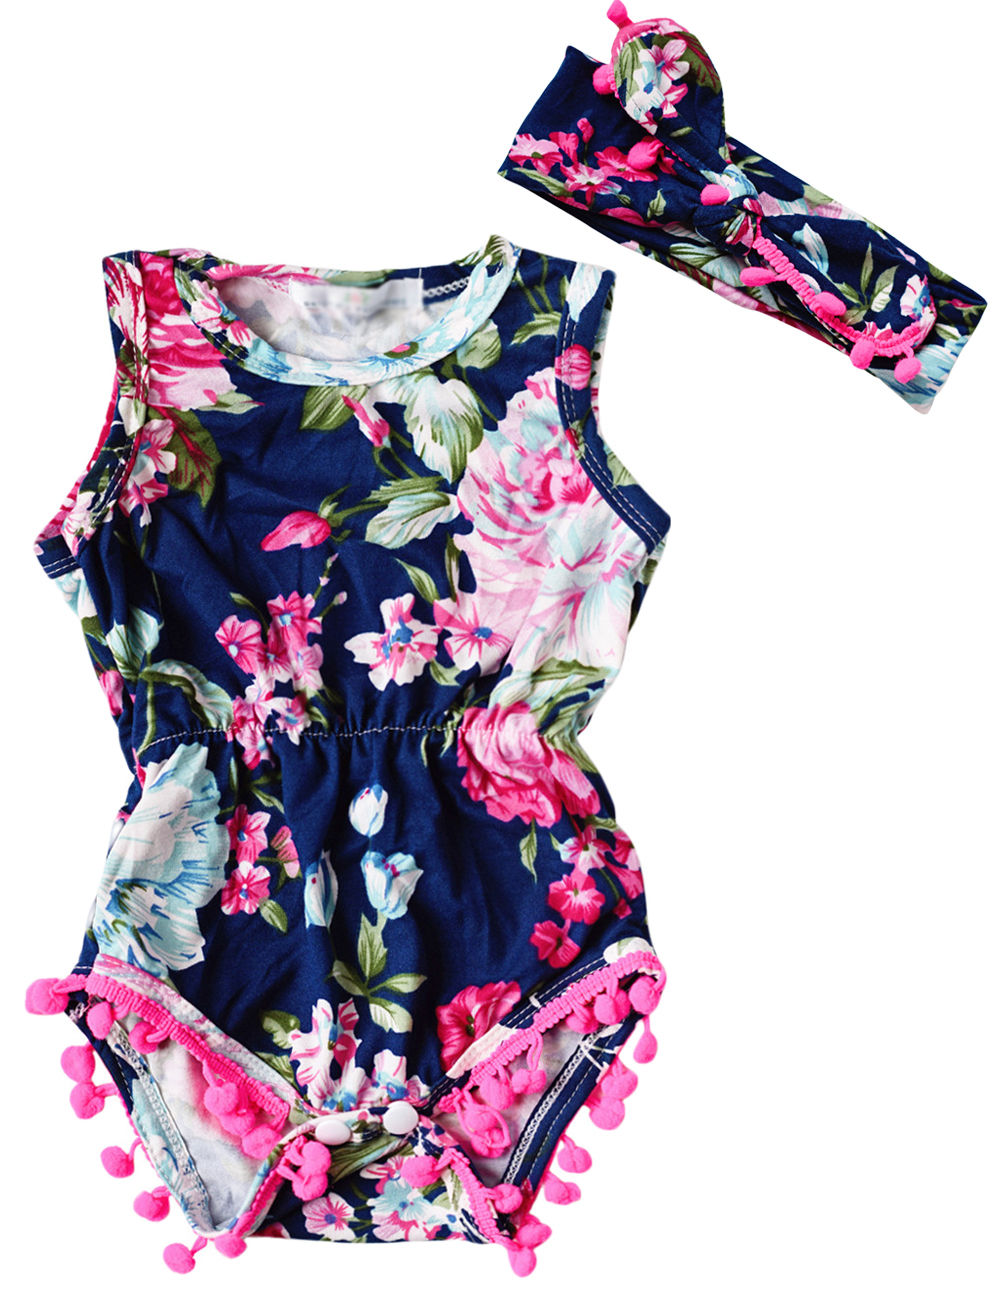 2016 Summer Baby Girl Pretty Romper Flower Tassel Romper Child Rosy Baby Girl baby floral romper baby girl jumpsuit outfits